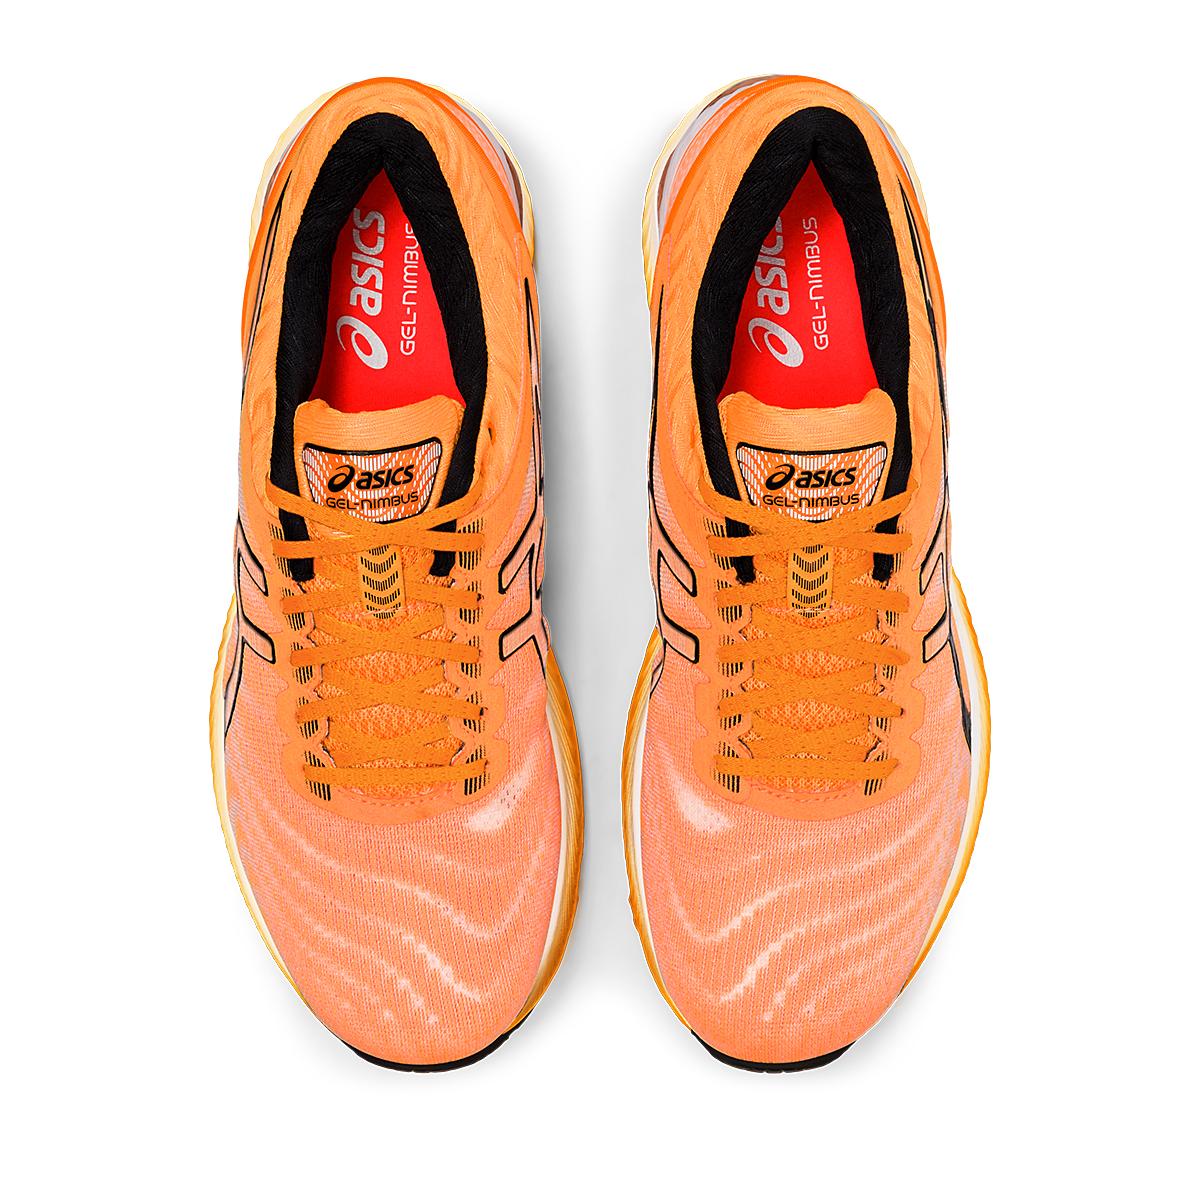 Men's Asics GEL-Nimbus 22 Modern Tokyo Running Shoe - Color: Orange Pop/Black - Size: 6 - Width: Regular, Orange Pop/Black, large, image 3